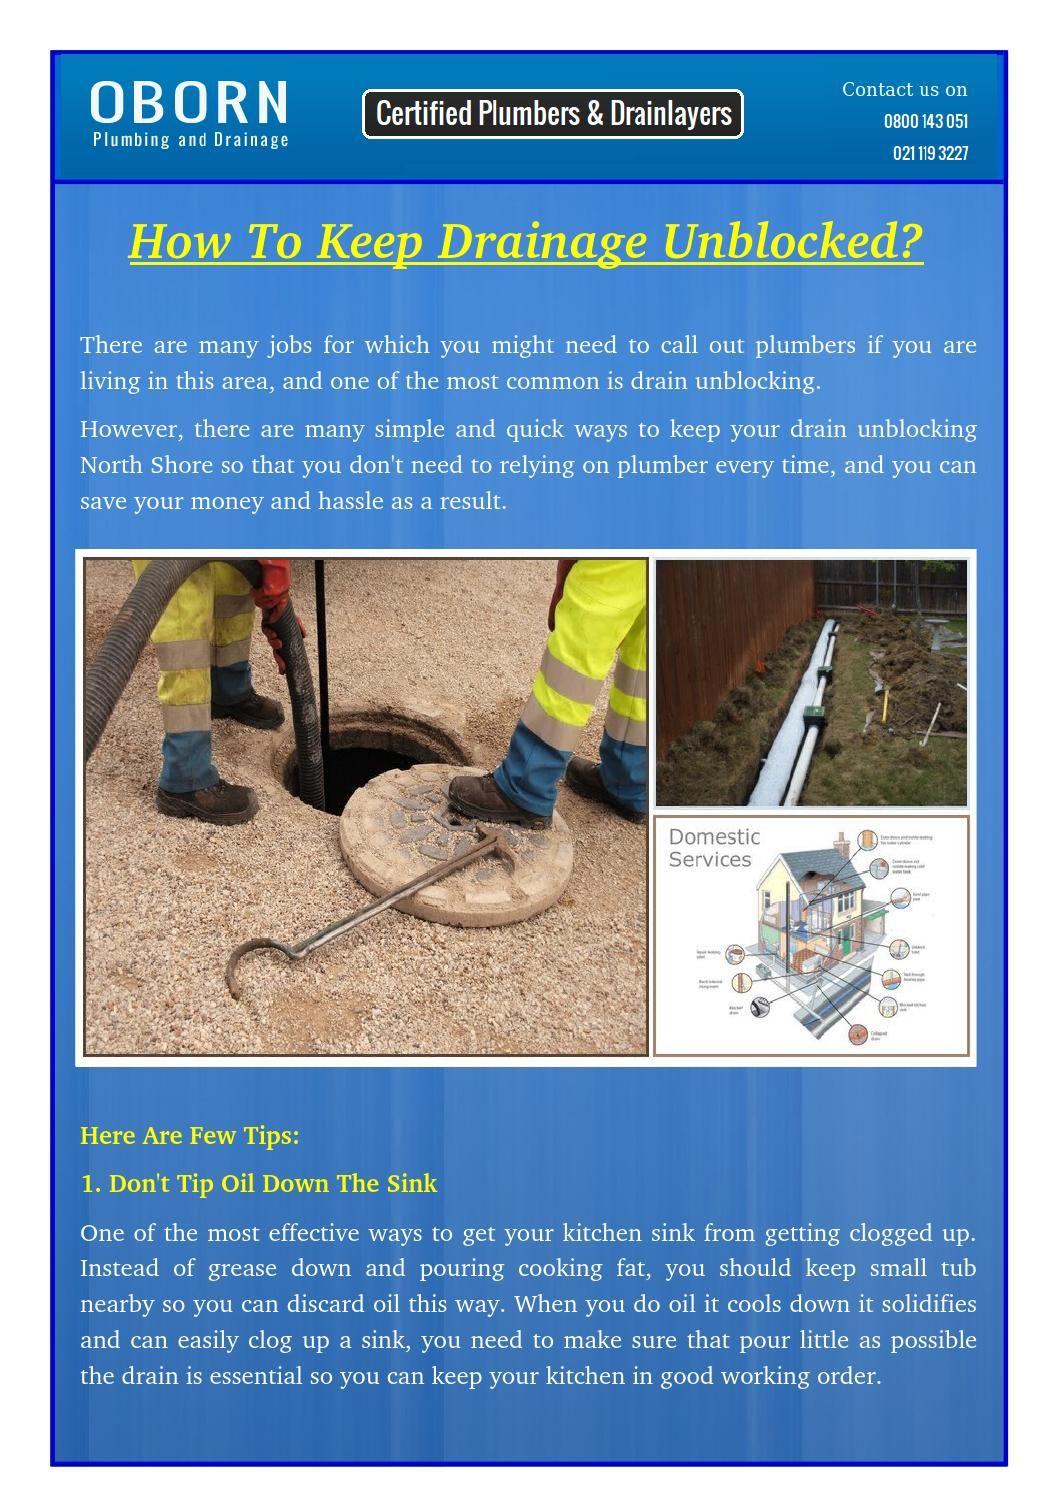 How To Keep Drainage Unblocked Drainage, Plumber, Plumbing